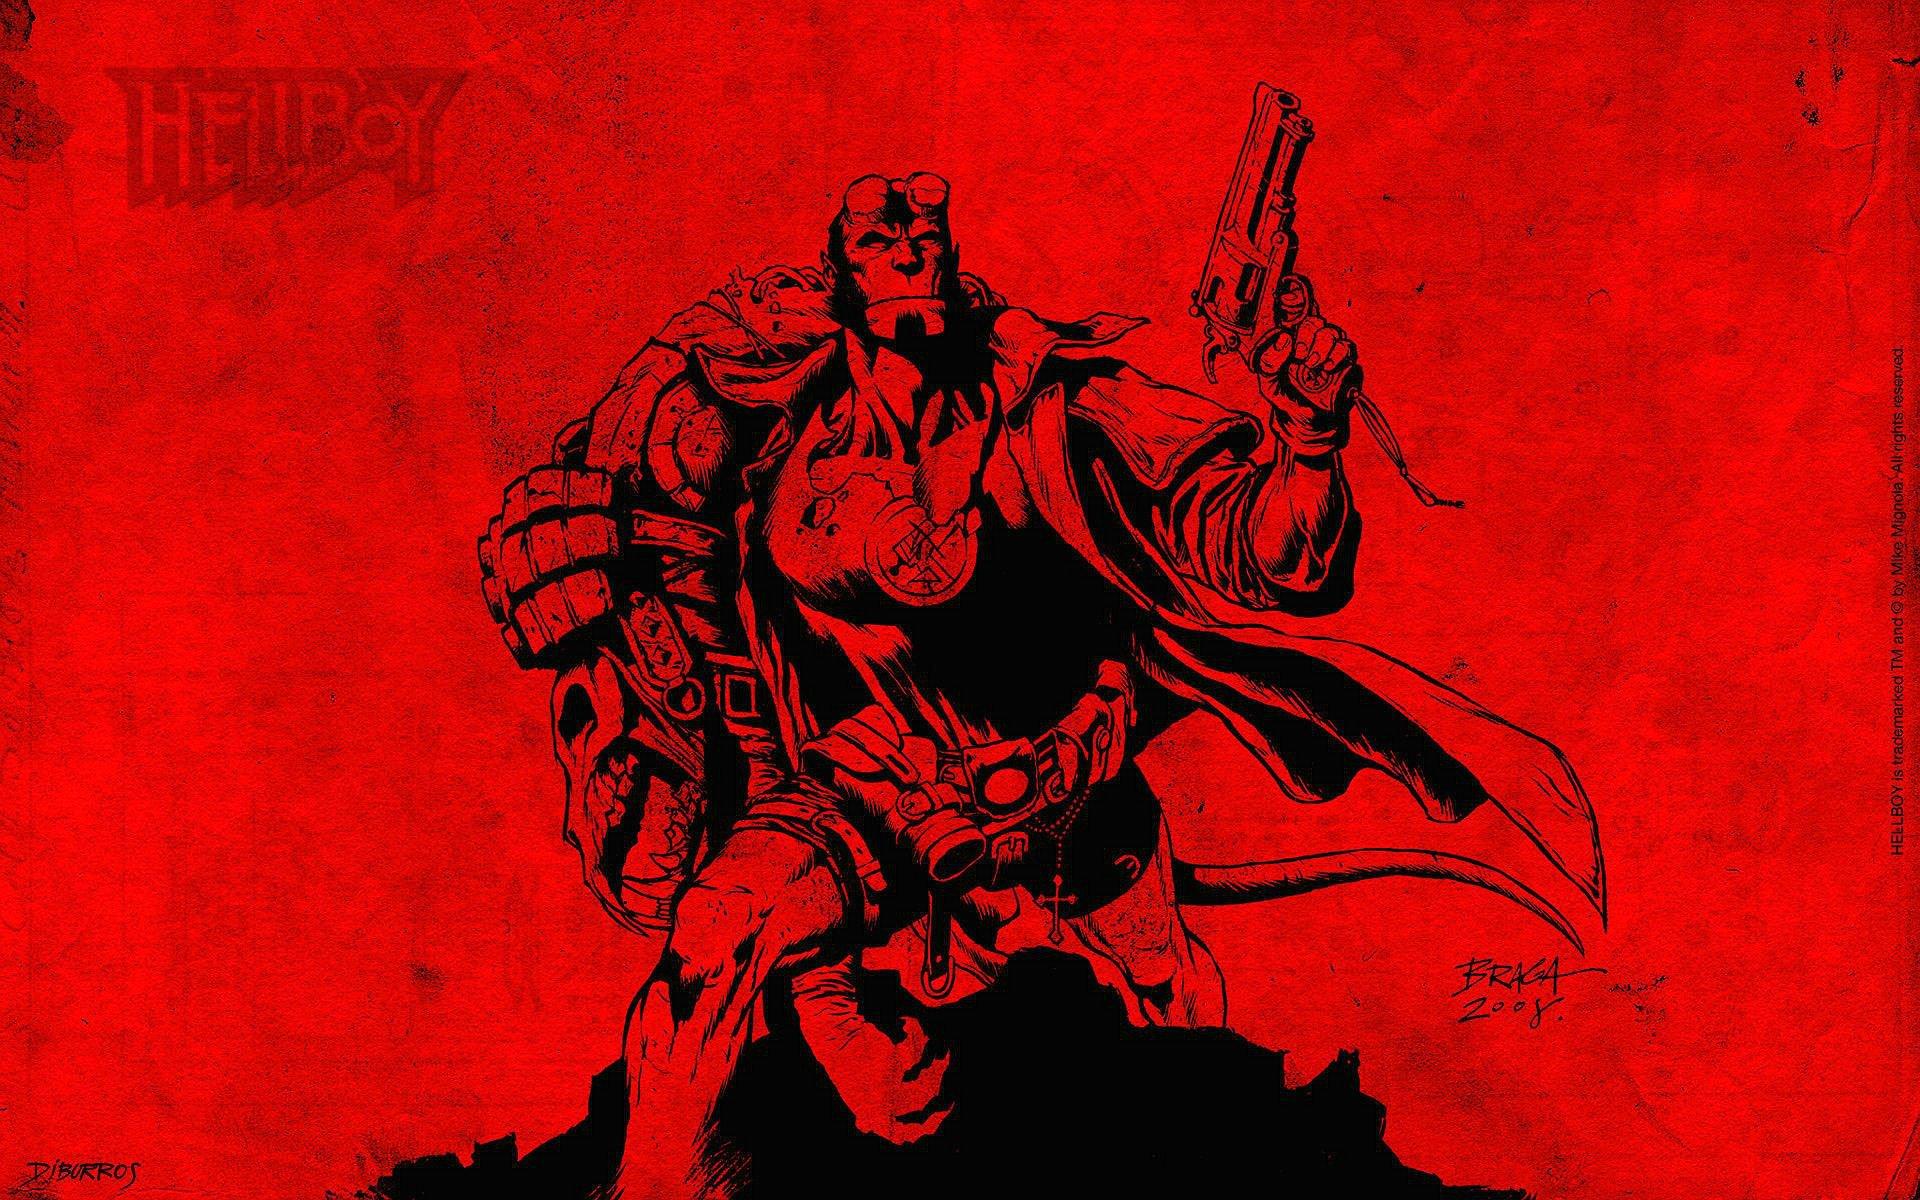 Fall Out Boy Iphone 6 Plus Wallpaper Hellboy Action Fantasy Comics Superhero Demon Monster Sci